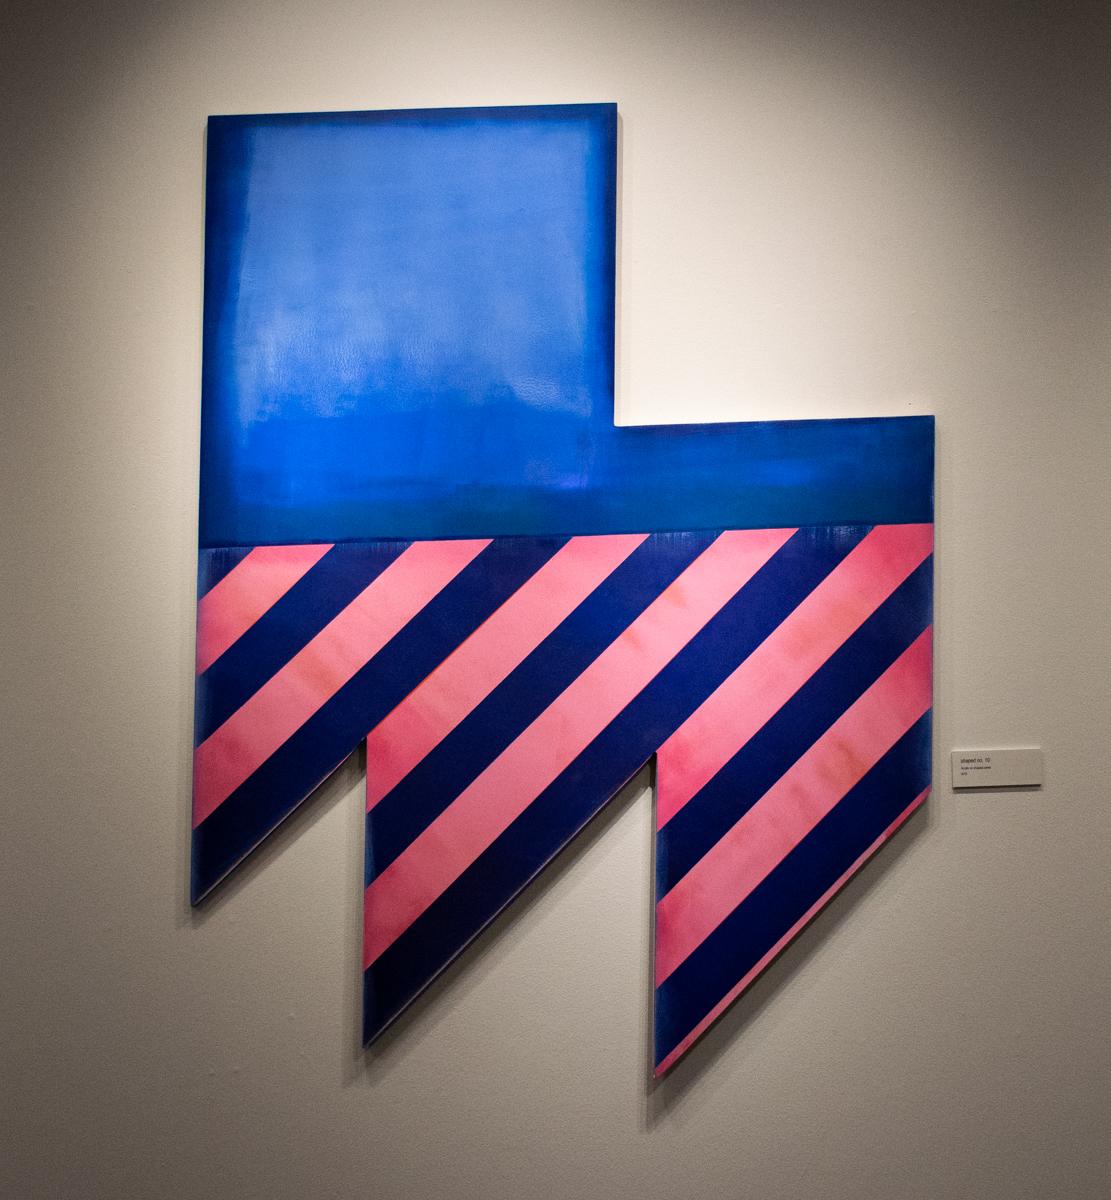 shaped no. 10  by Dustyn Bork, acrylic on shaped panel